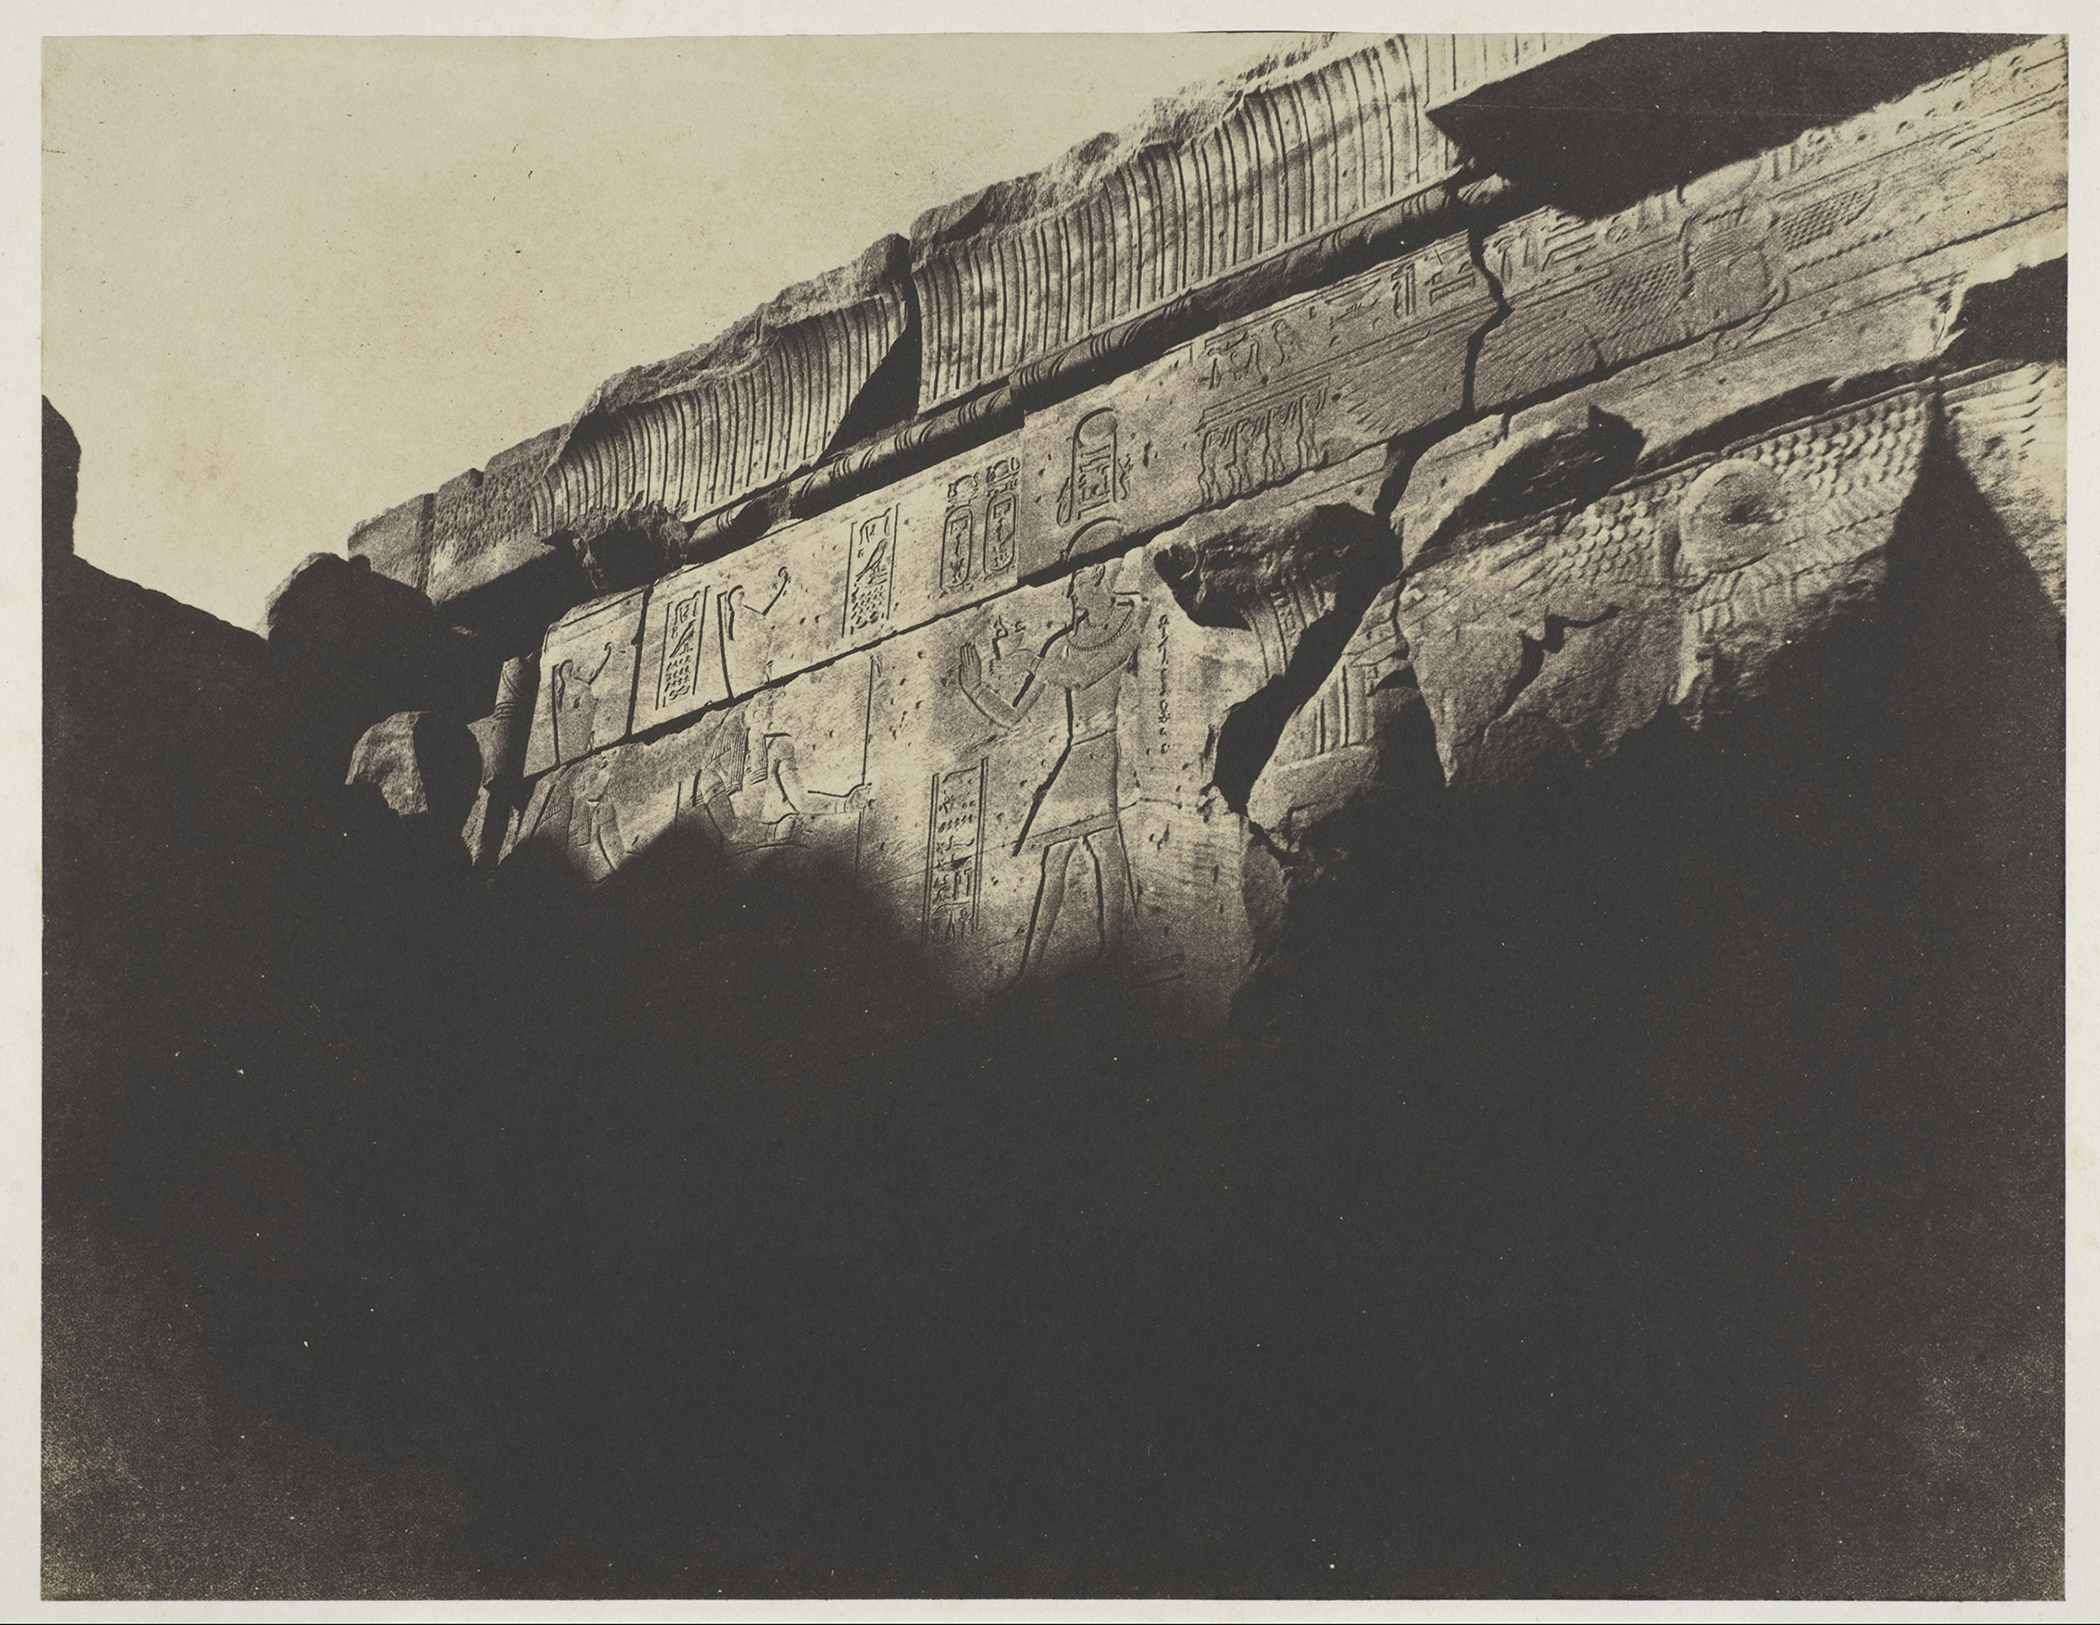 John Beasley Greene,  Dakka. Southern Chamber of the Temple, No. 6,  1854; The Metropolitan Museum of Art, New York, Gilman Collection, Purchase, Joseph M. Cohen Gift, 2005